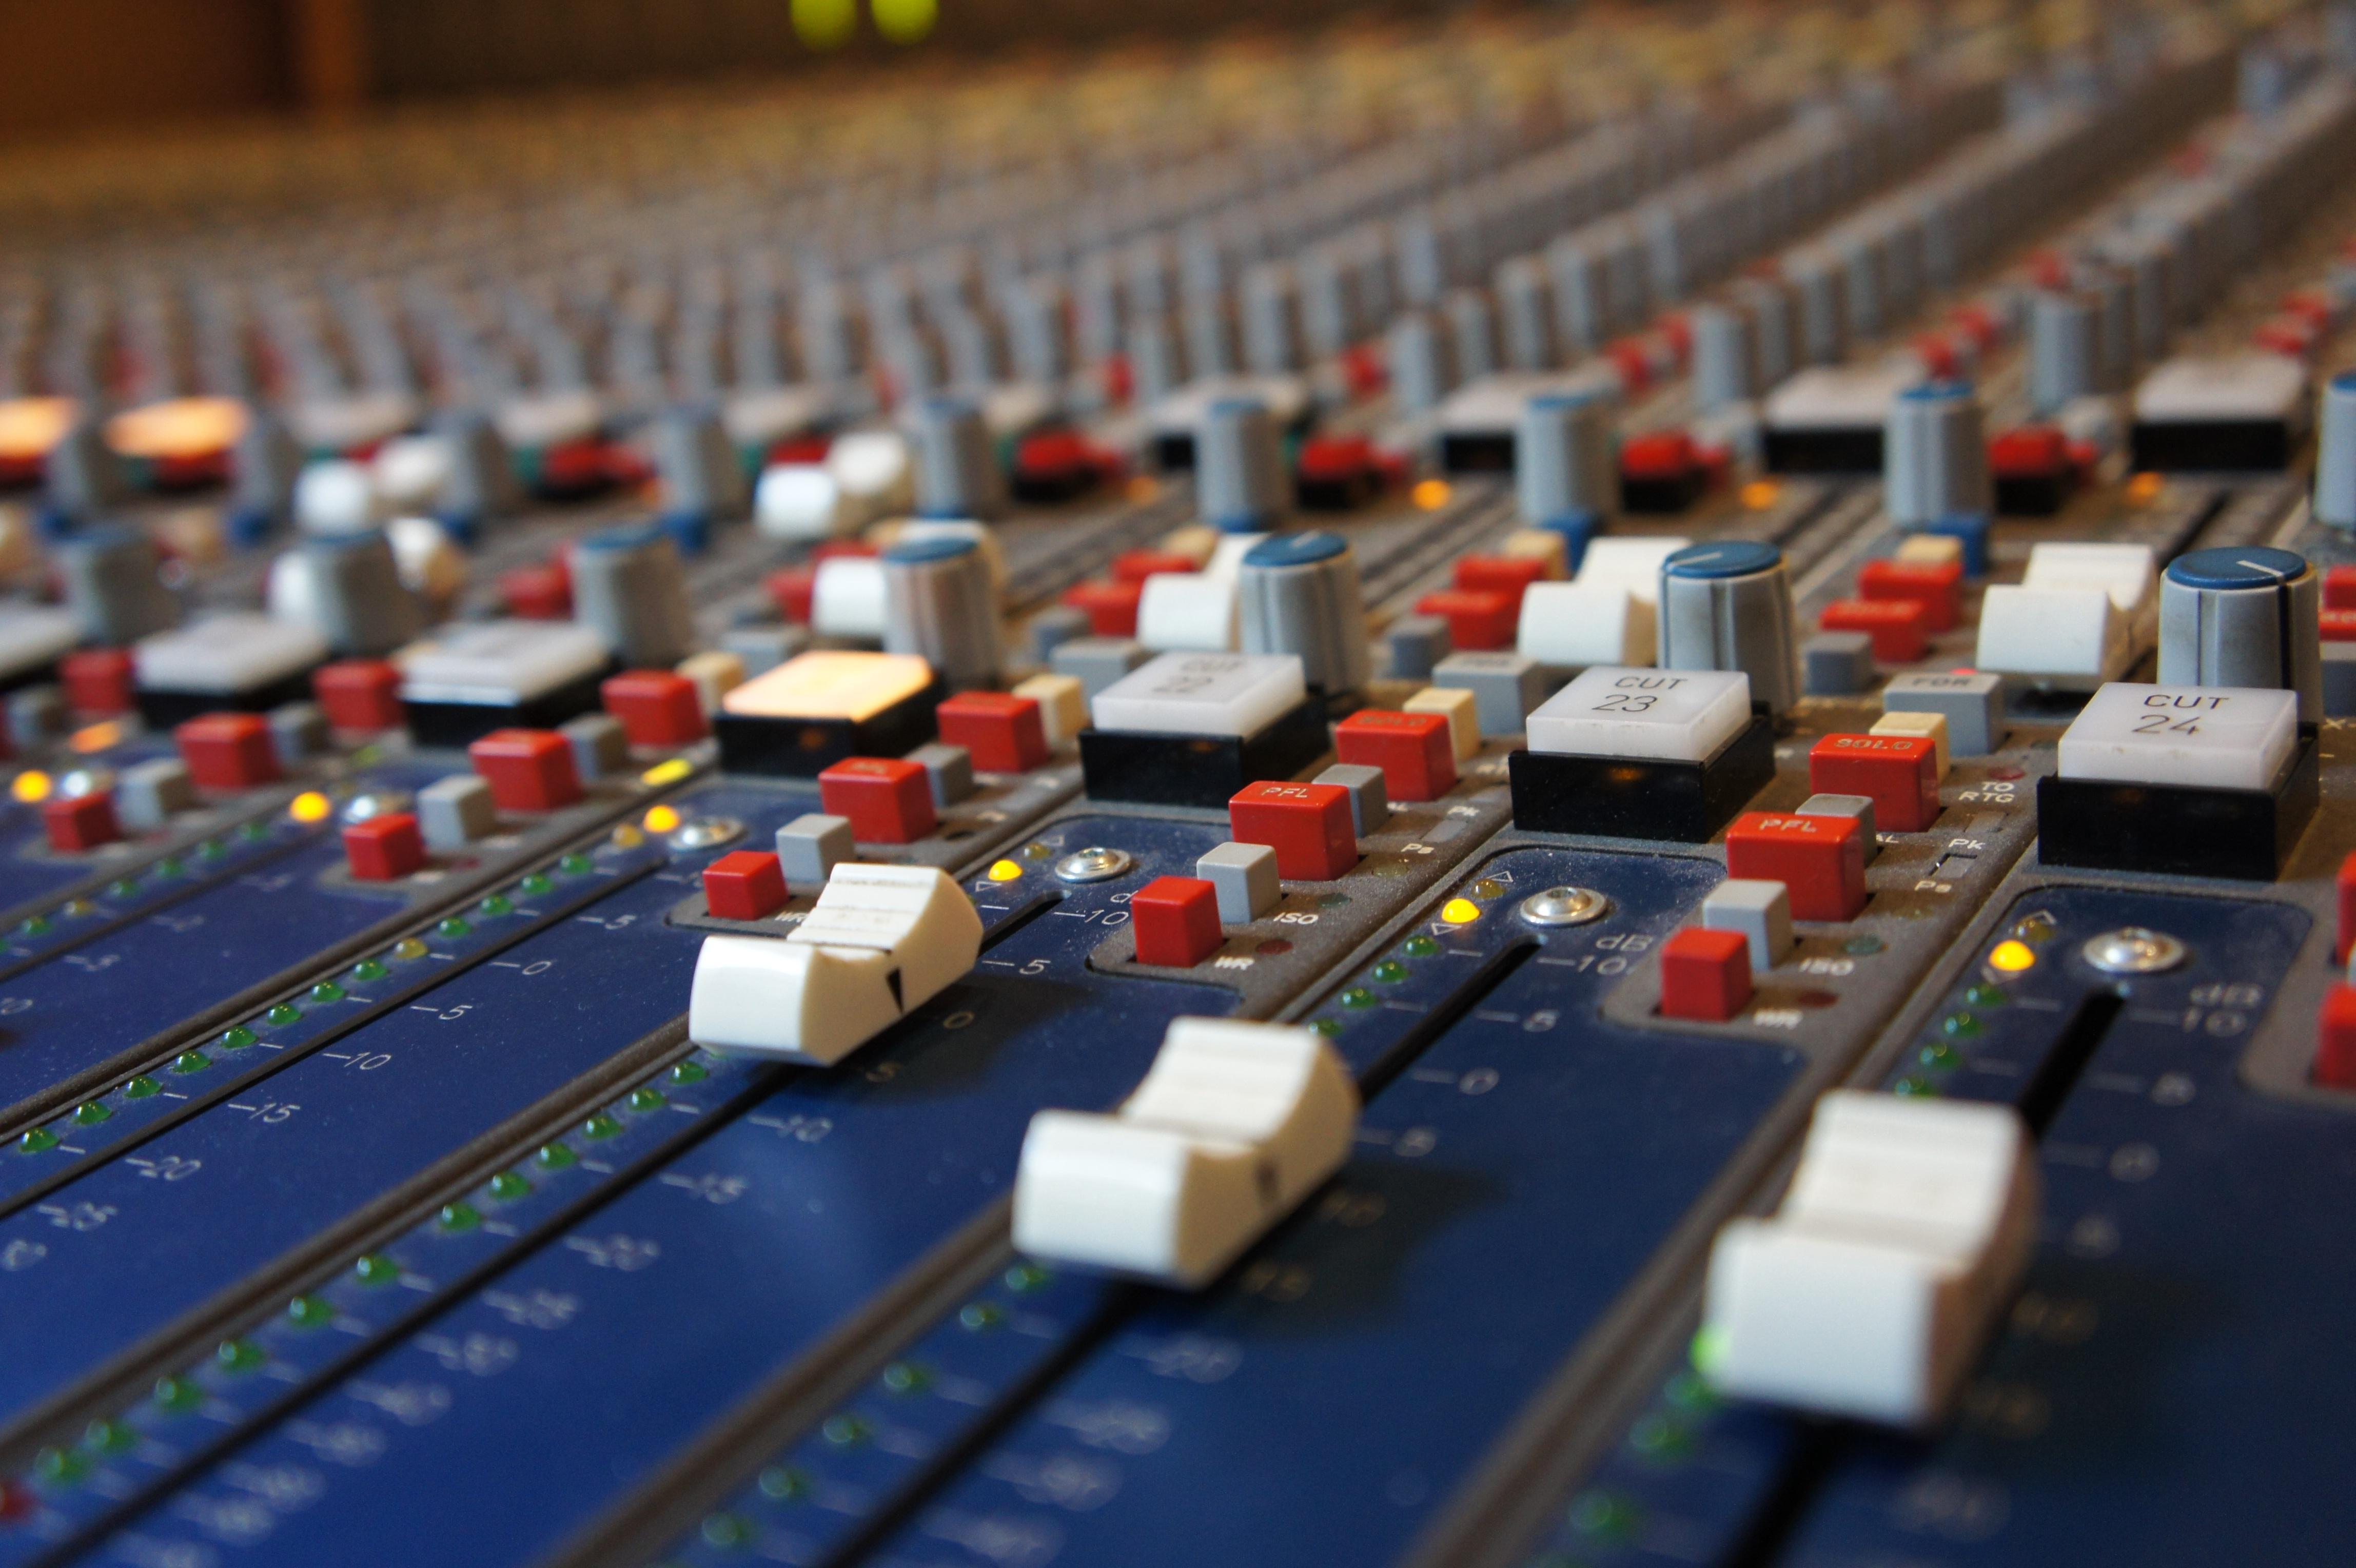 Free Images : desk, analog, recording studio, equalizer